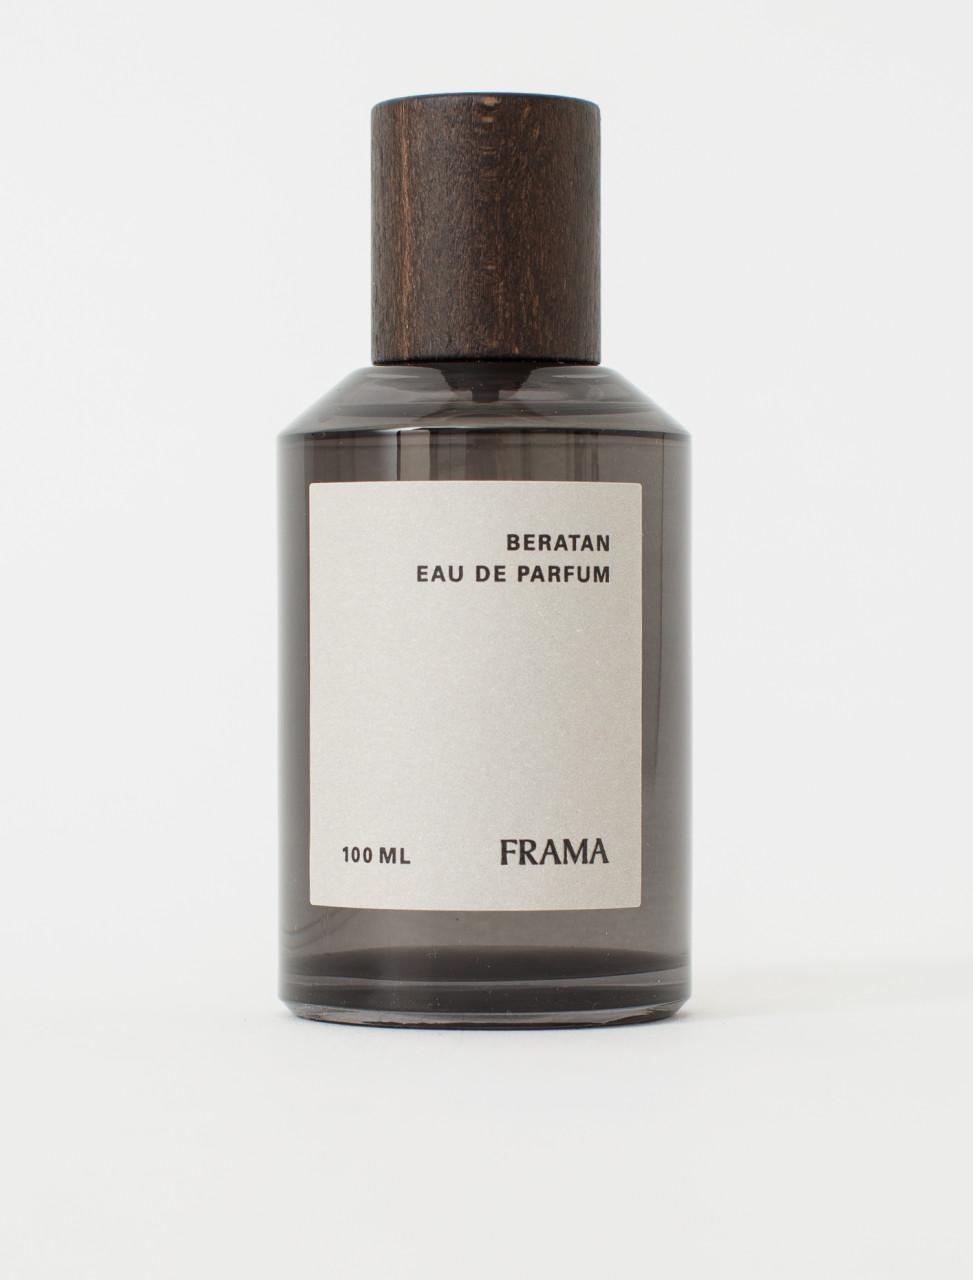 Beratan | Eau de Parfum 100 ml